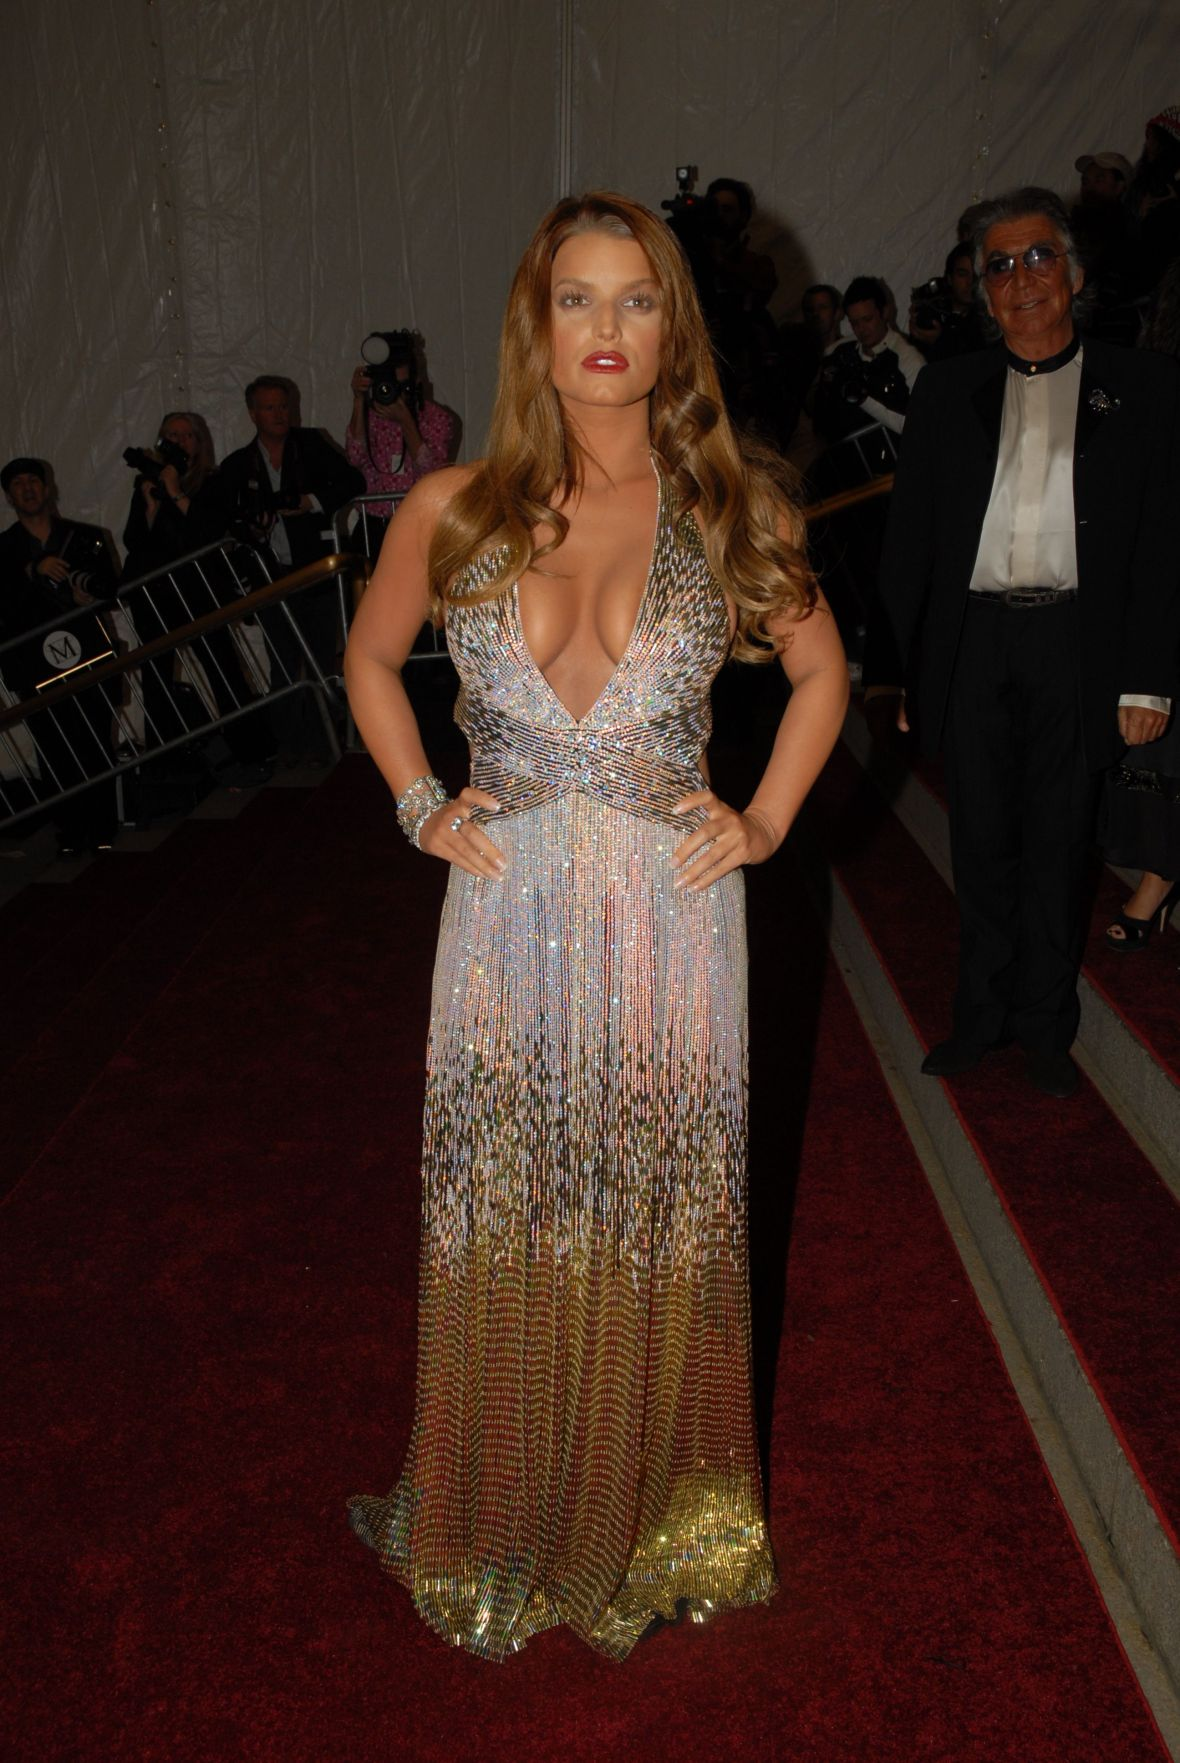 Jessica Simpson Body Shamed Over Met Gala Dress